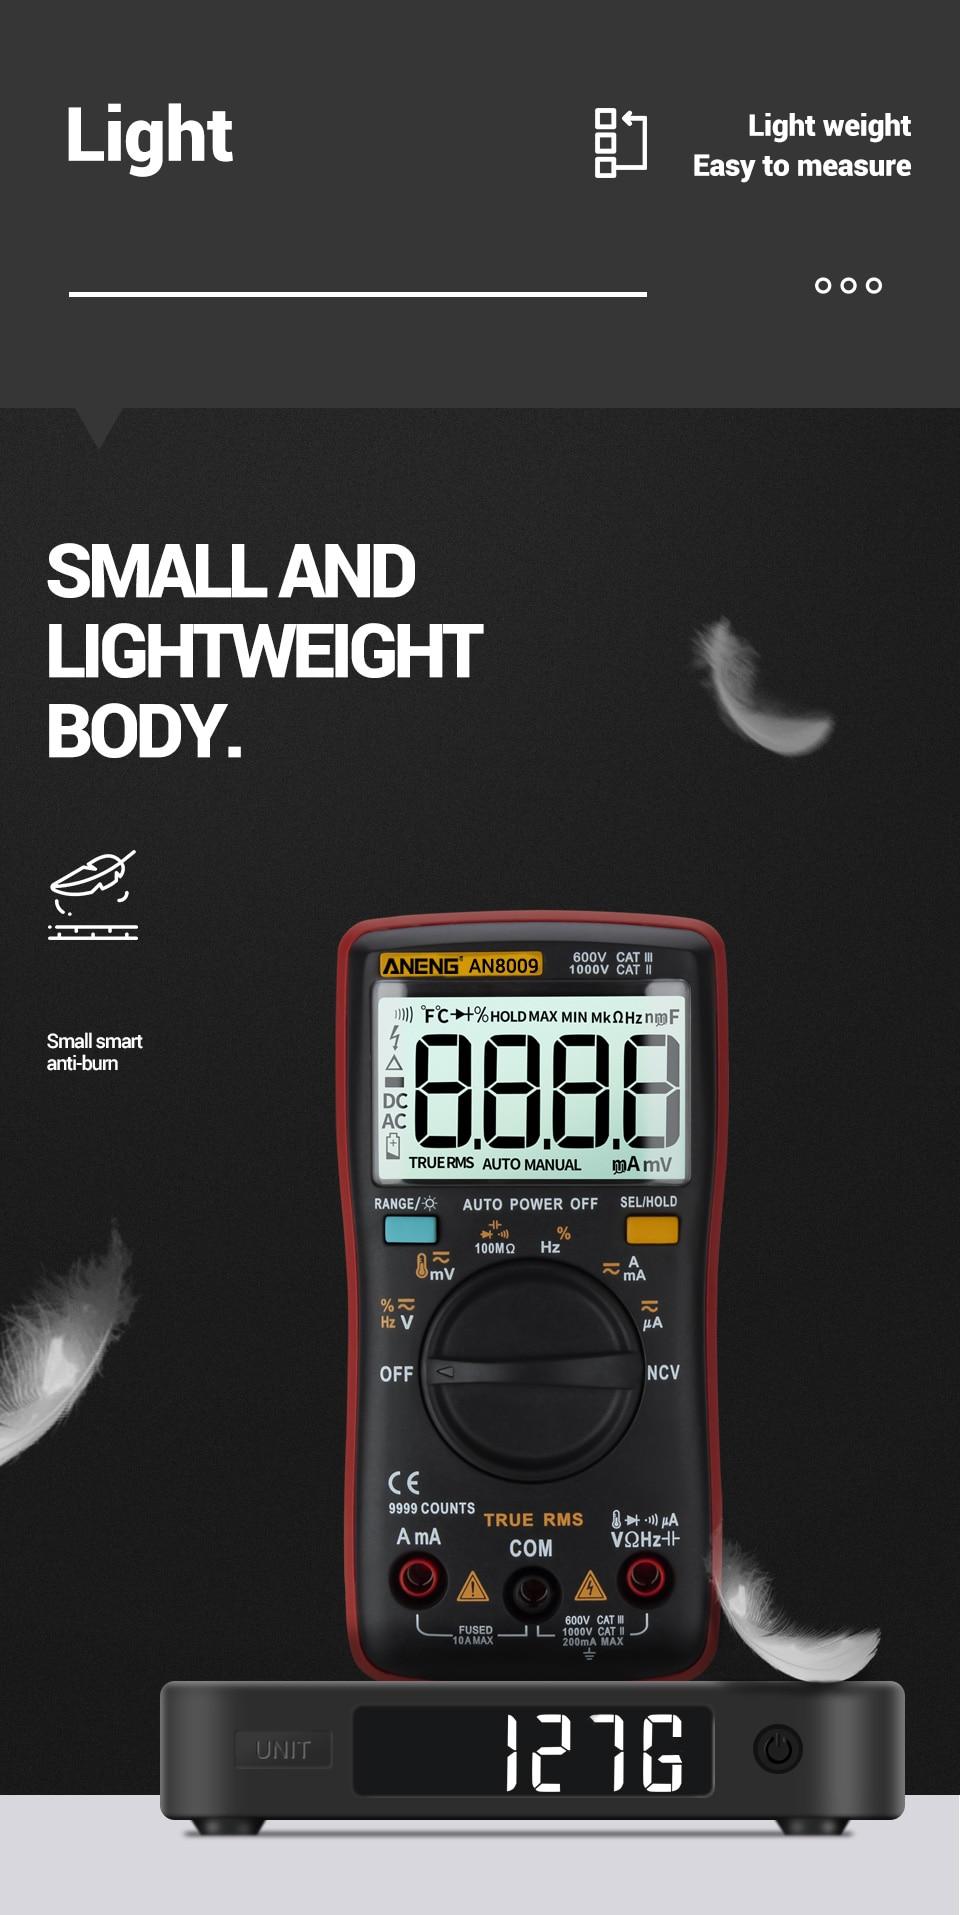 H57f056d57eec4cc0906653691e330d98F ANENG AN8009 True-RMS Digital Multimeter transistor tester capacitor tester automotive electrical capacitance meter temp diode